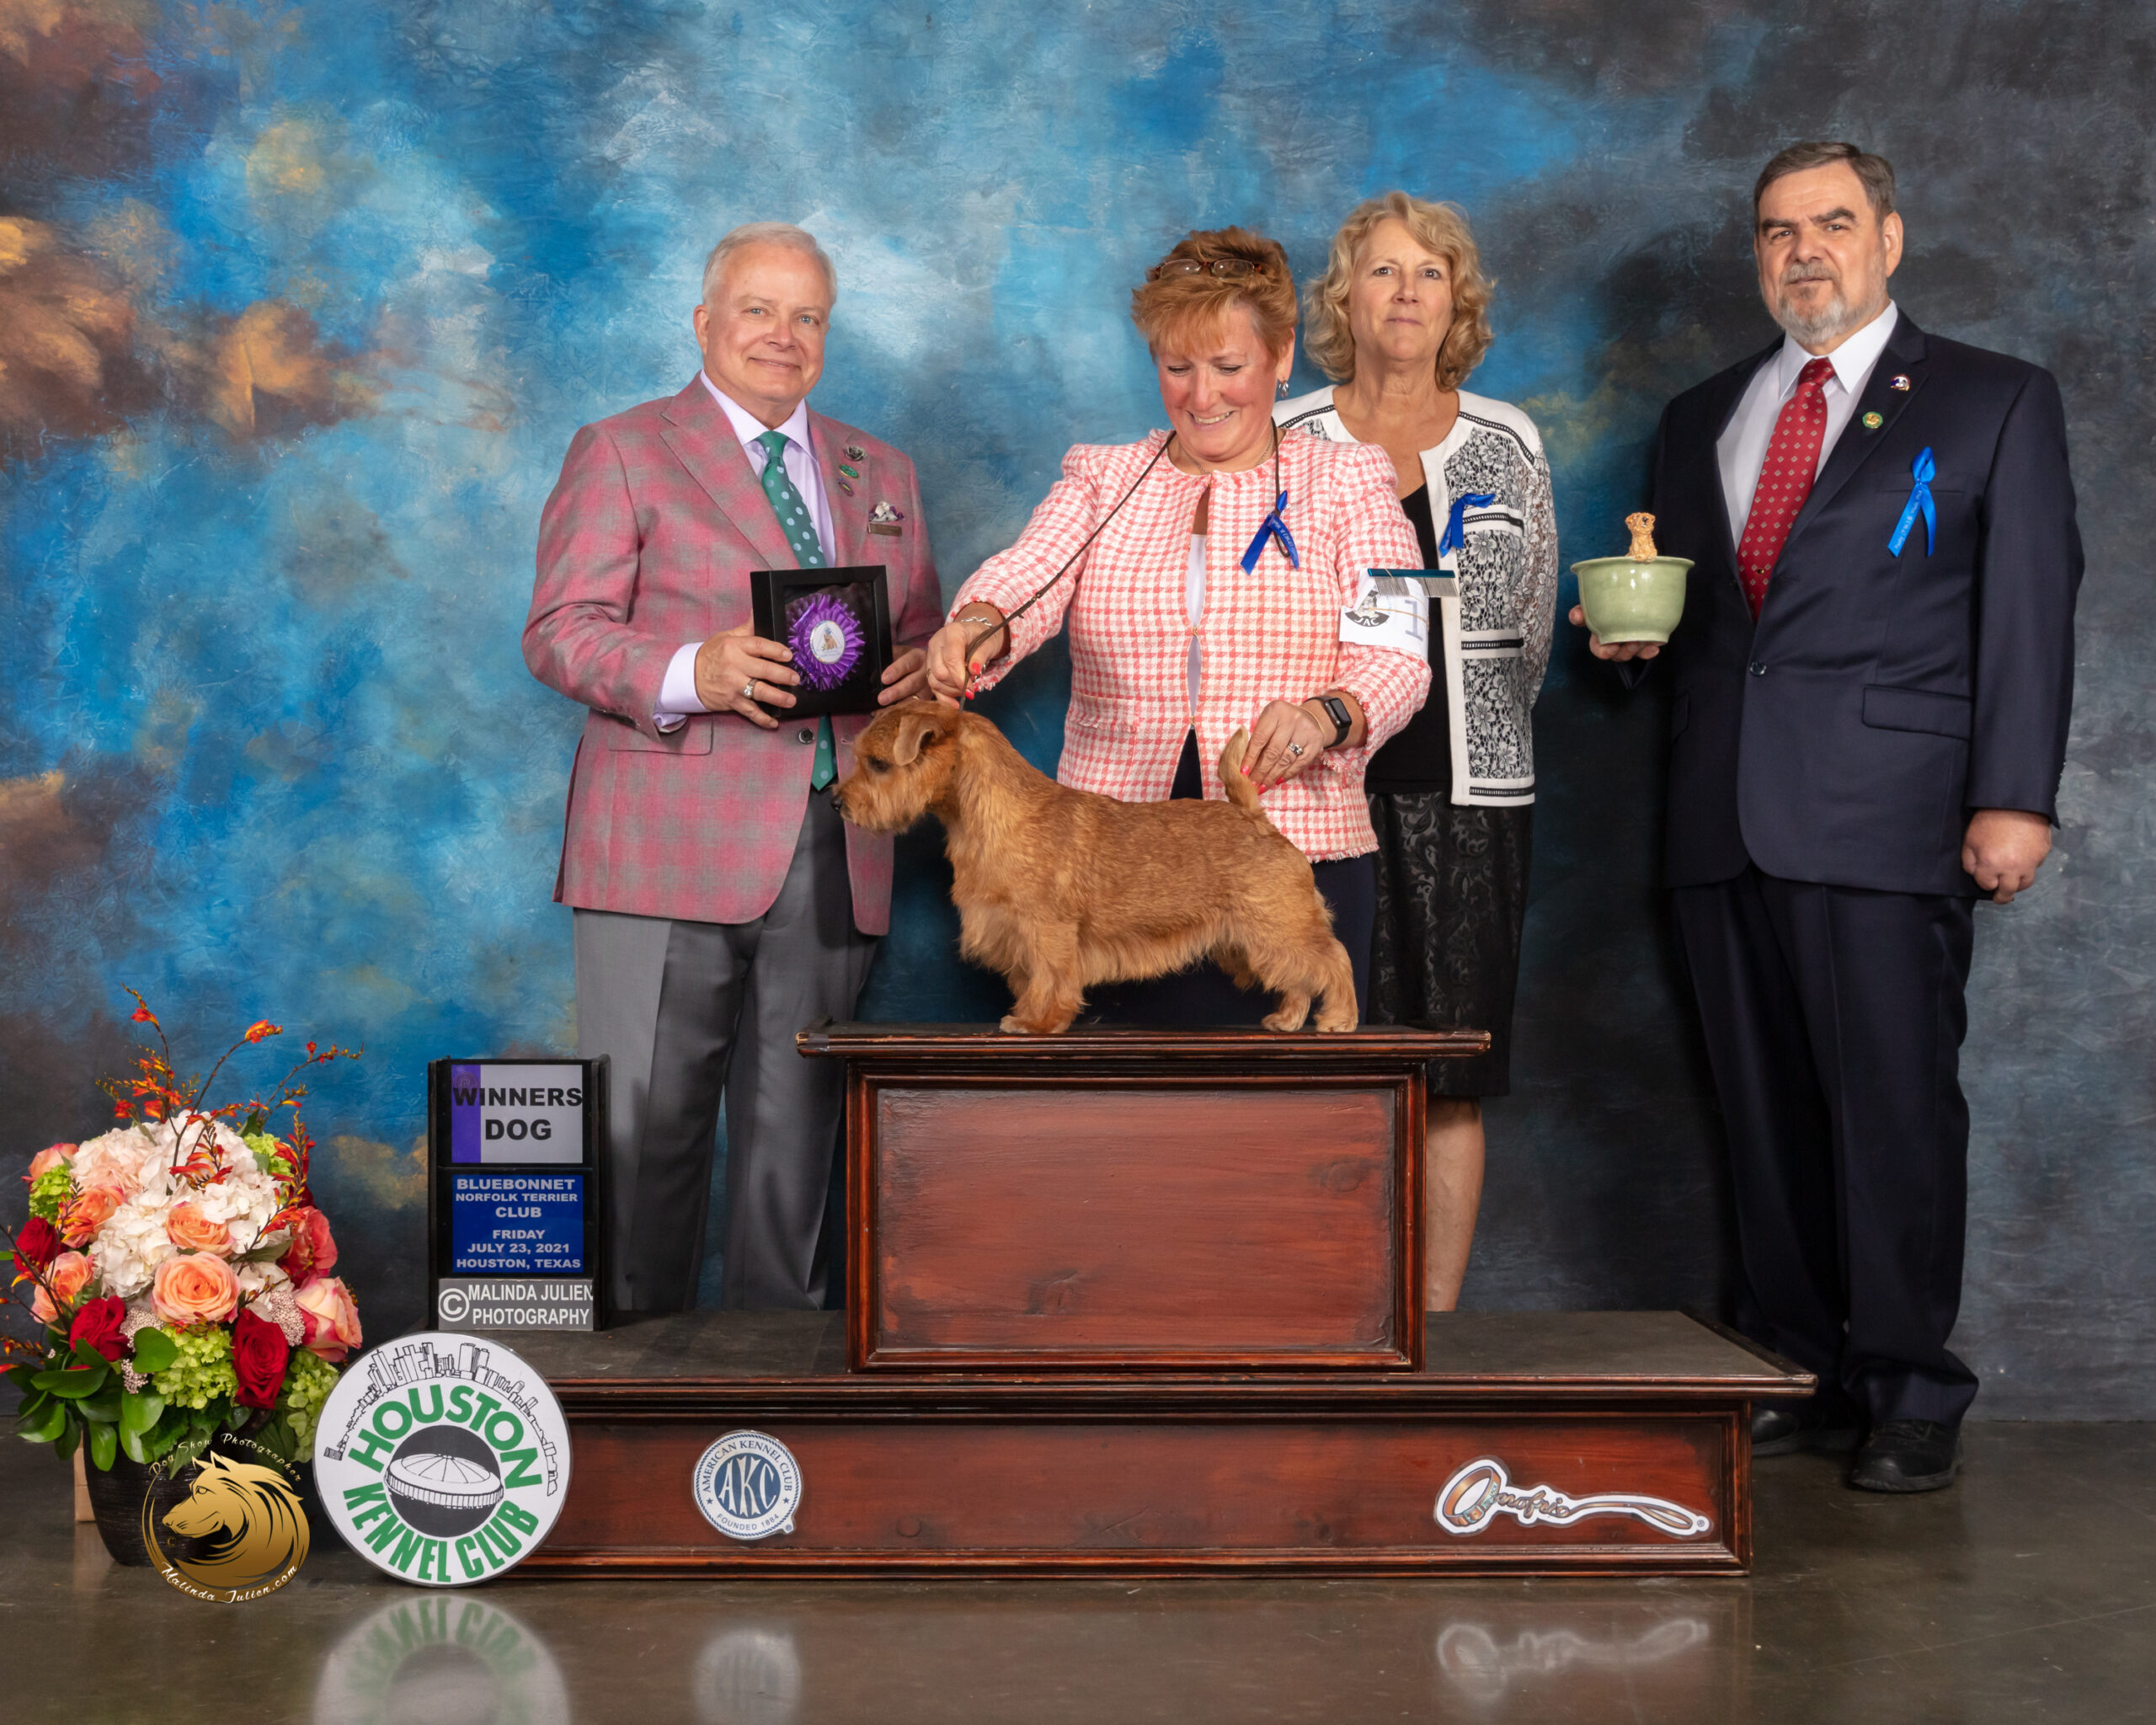 Norfolk_Terrier_#11_Fri_WD_Judge_Dennis_Mccoy-MMJ_0652-HOUSTON21-HR3-(ZF-10718-03024-2-003)